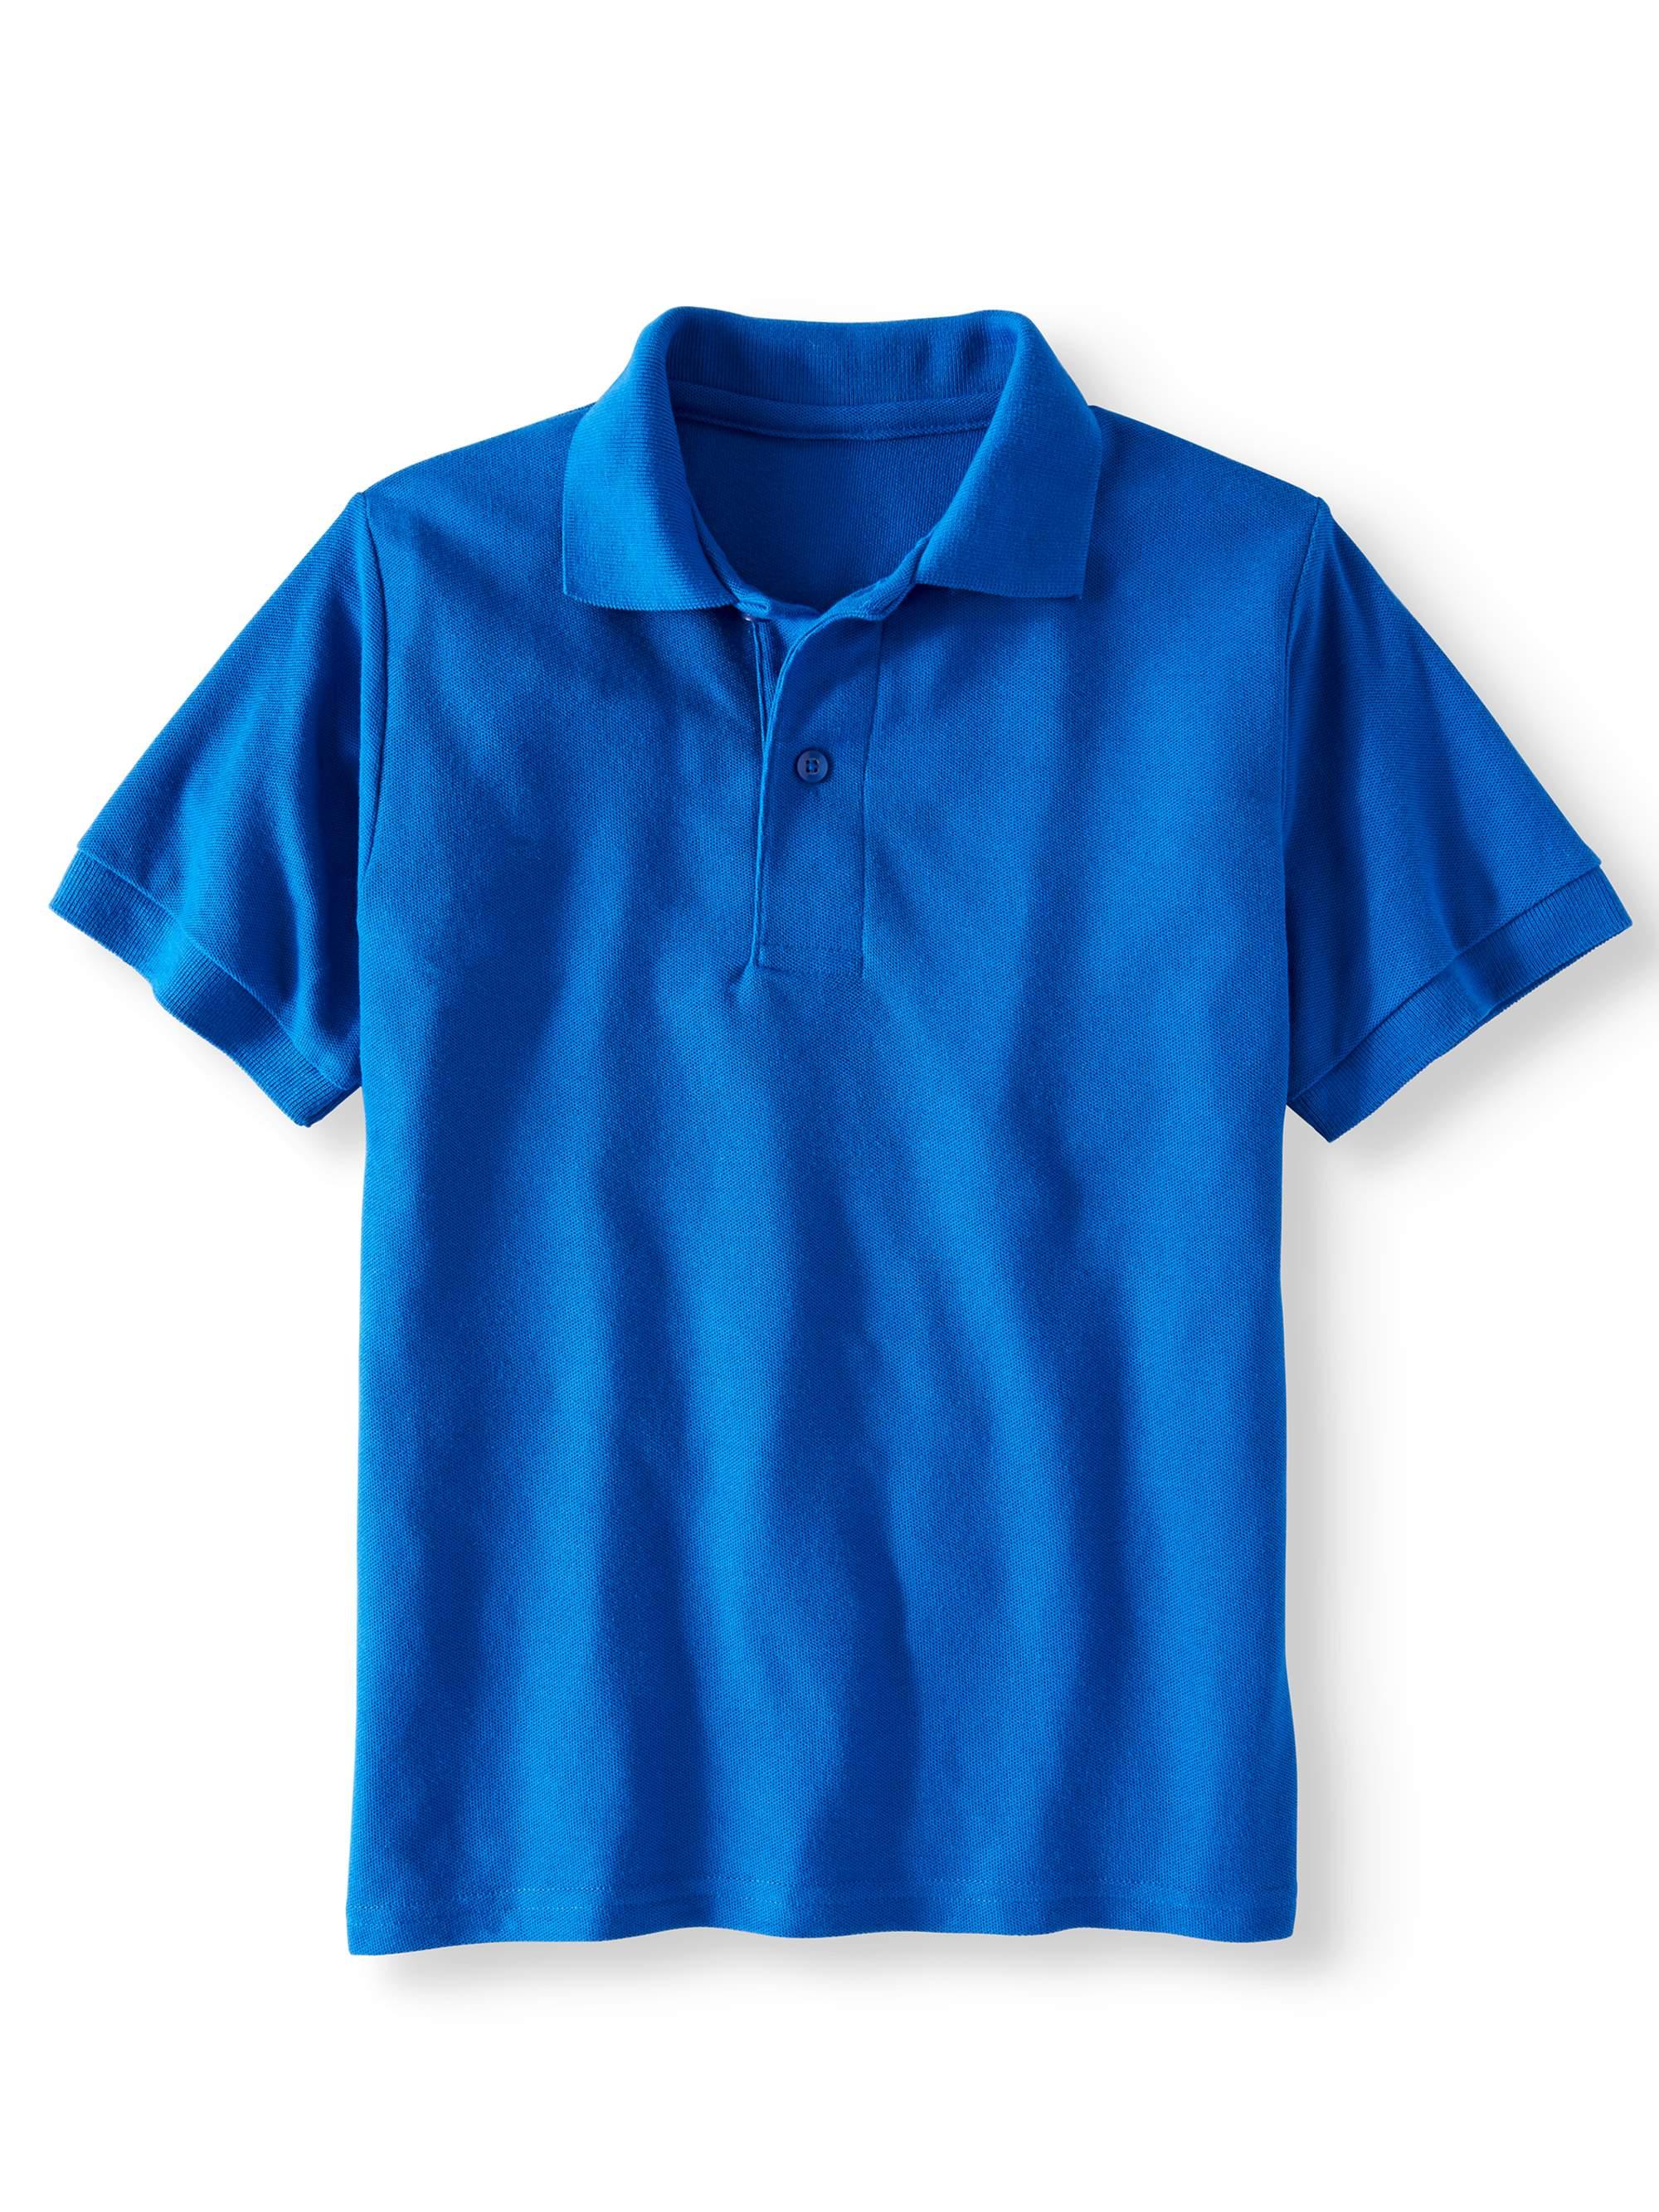 Boys' School Uniform Short Sleeve Wrinkle Resistant Performance Polo Shirt